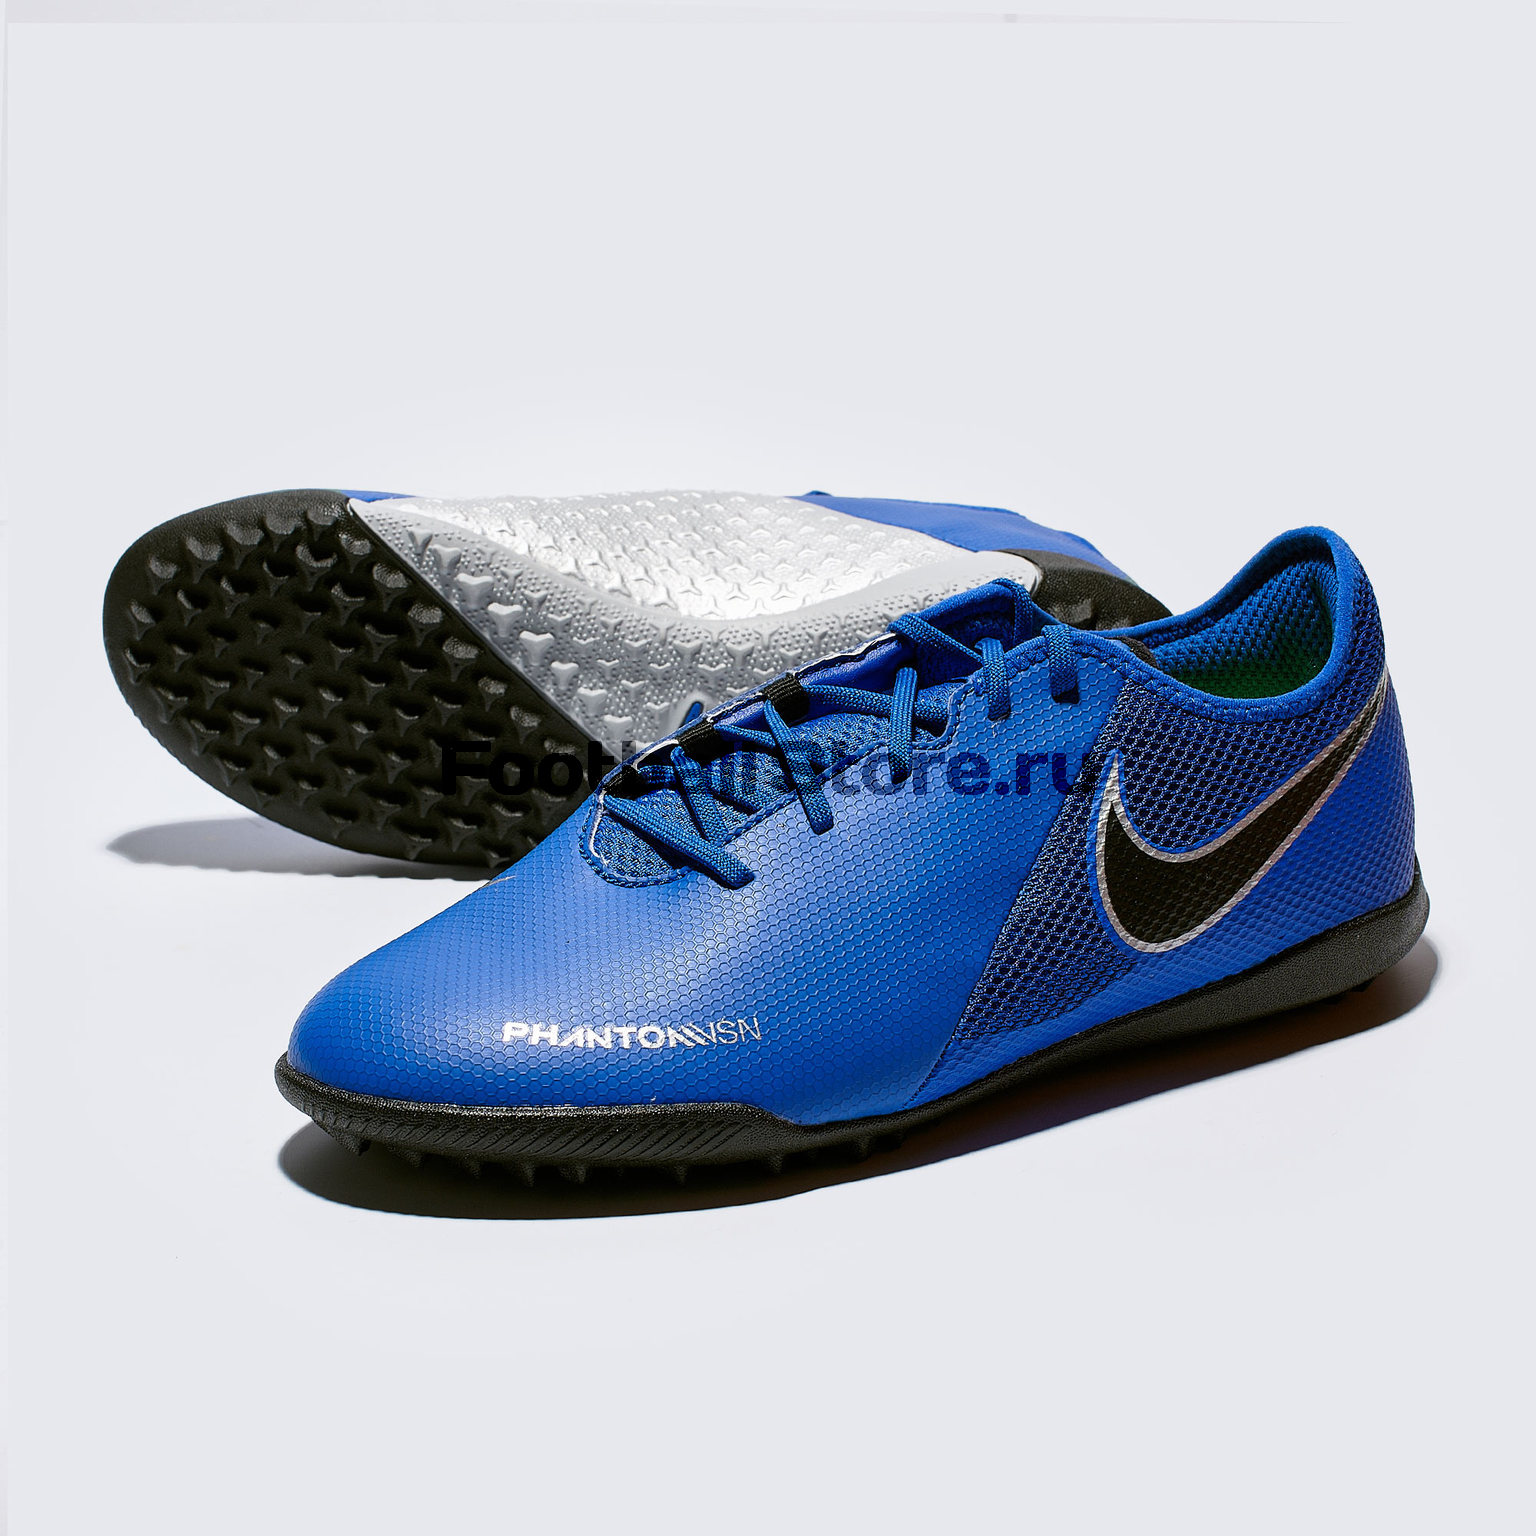 Шиповки Nike Phantom Vision Academy TF AO3223-400